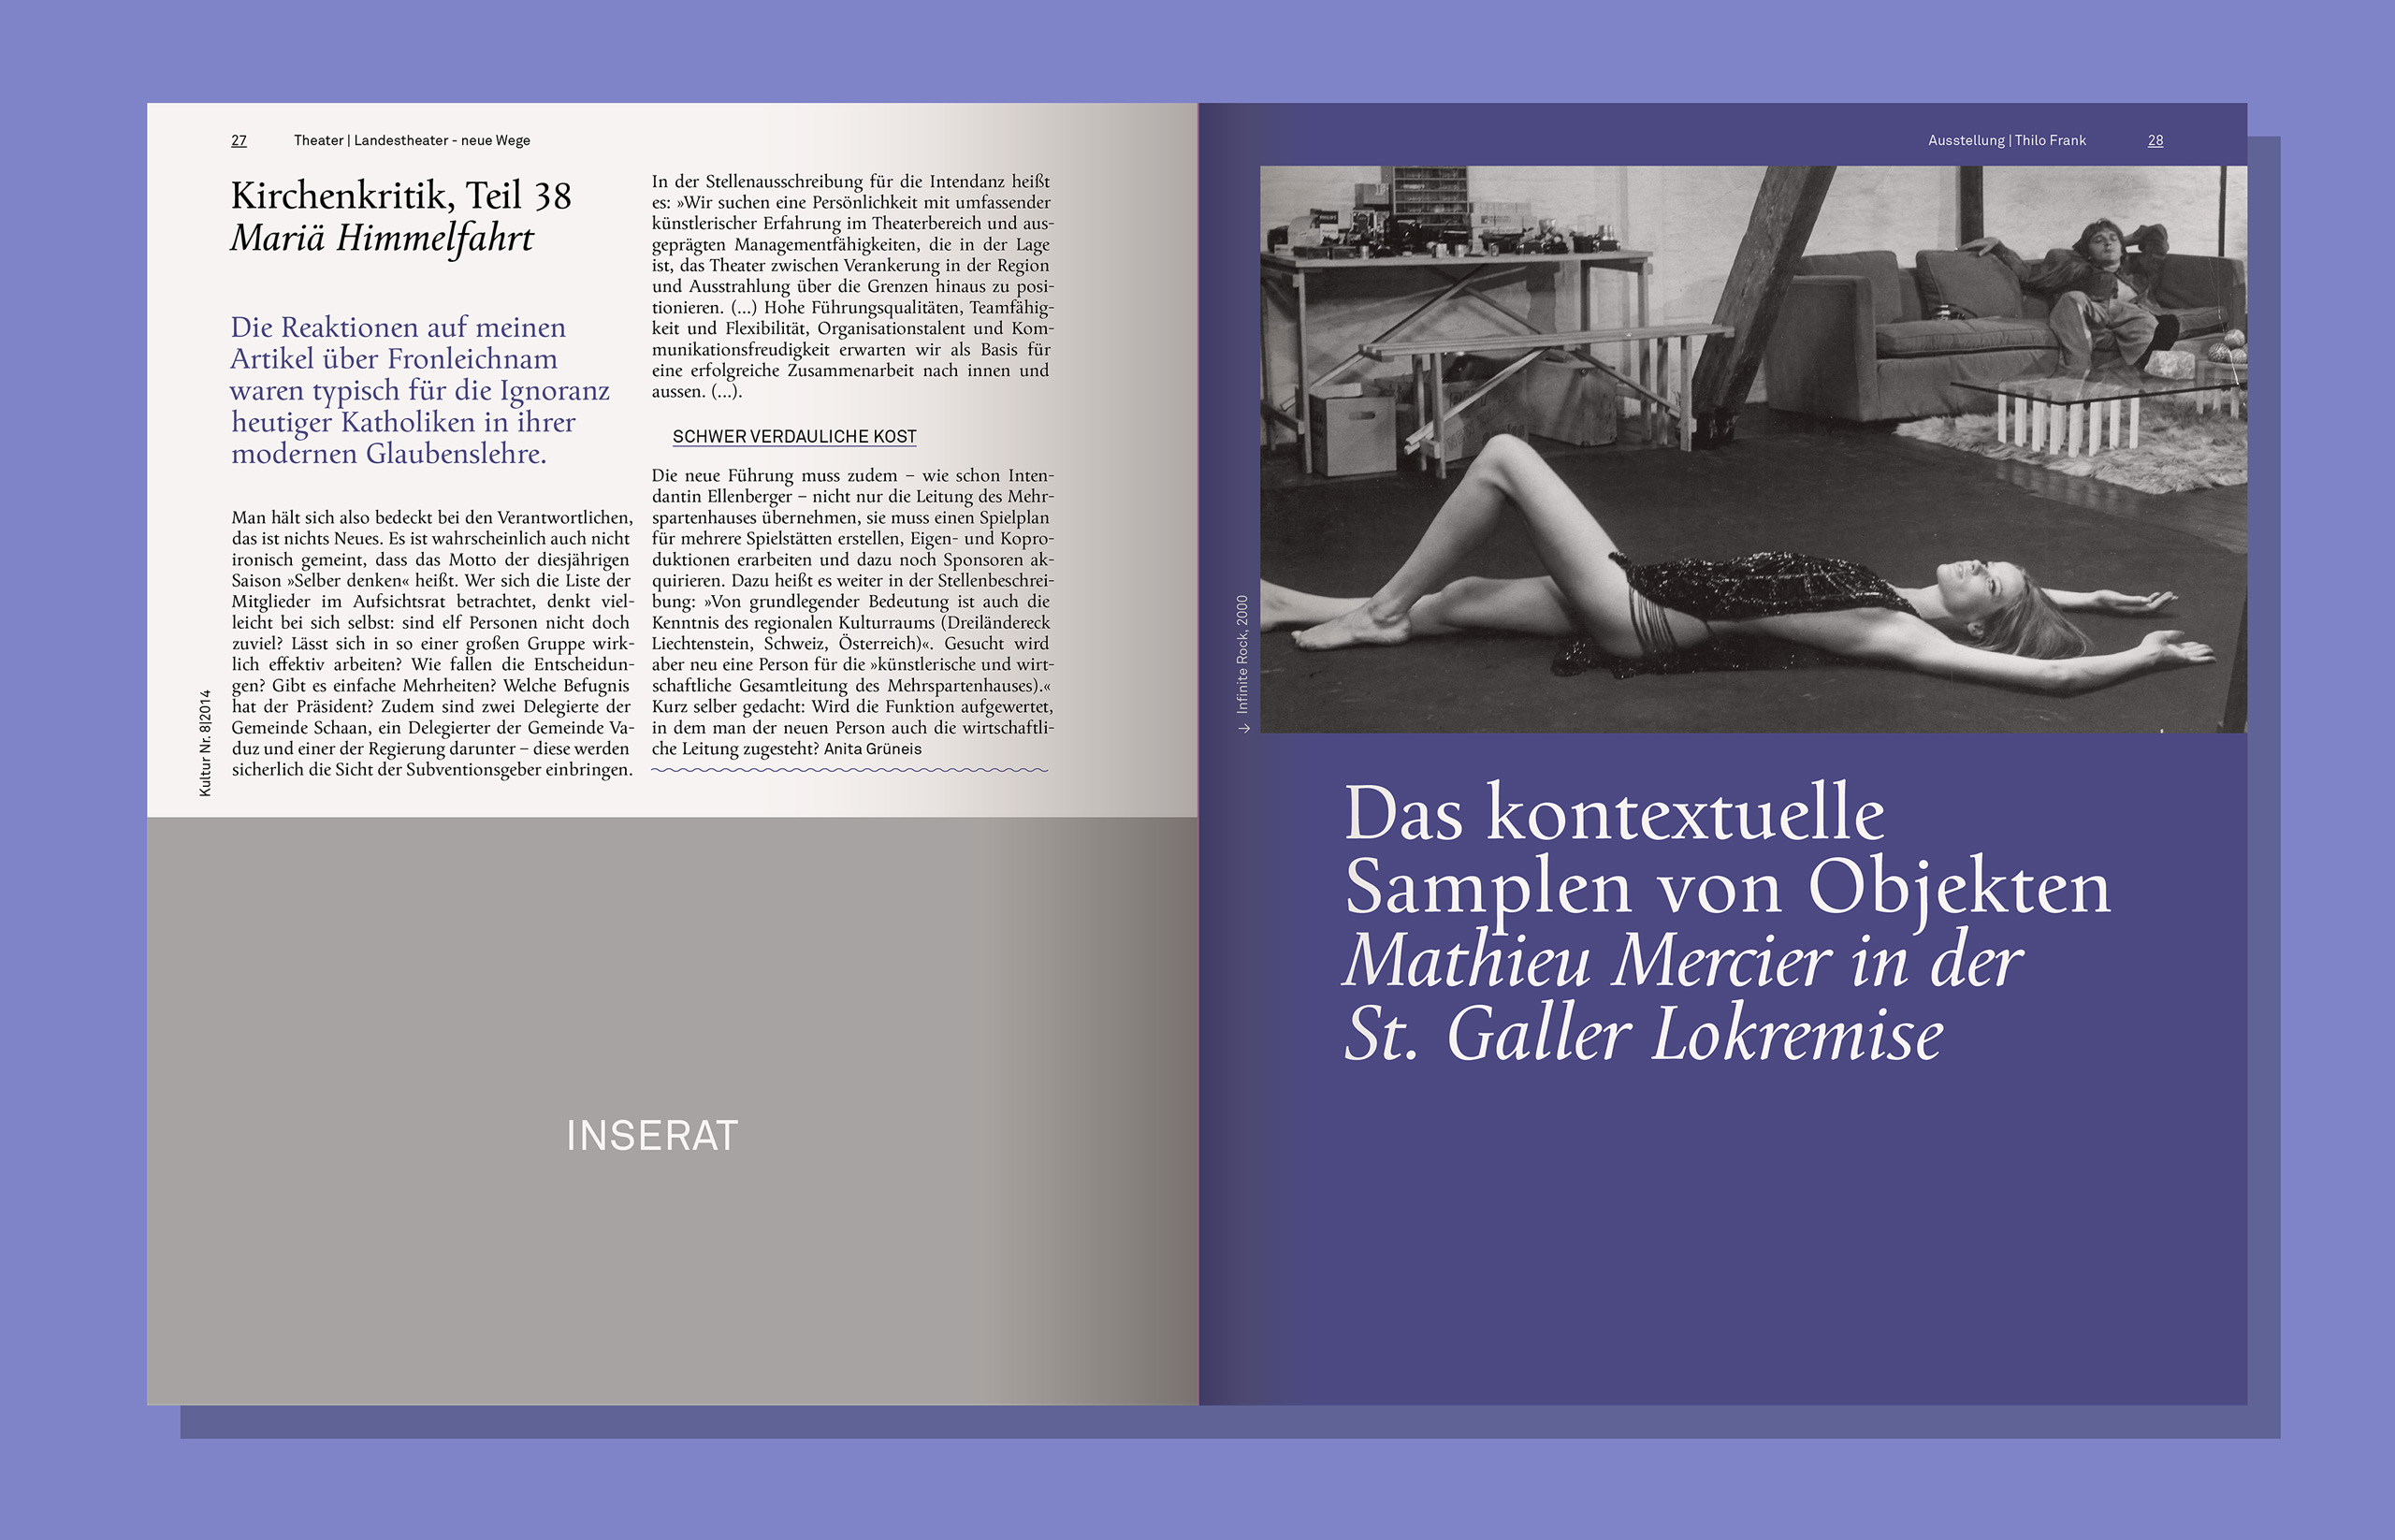 KULTUR_Zeitschrift_Redesign_Spitaler13